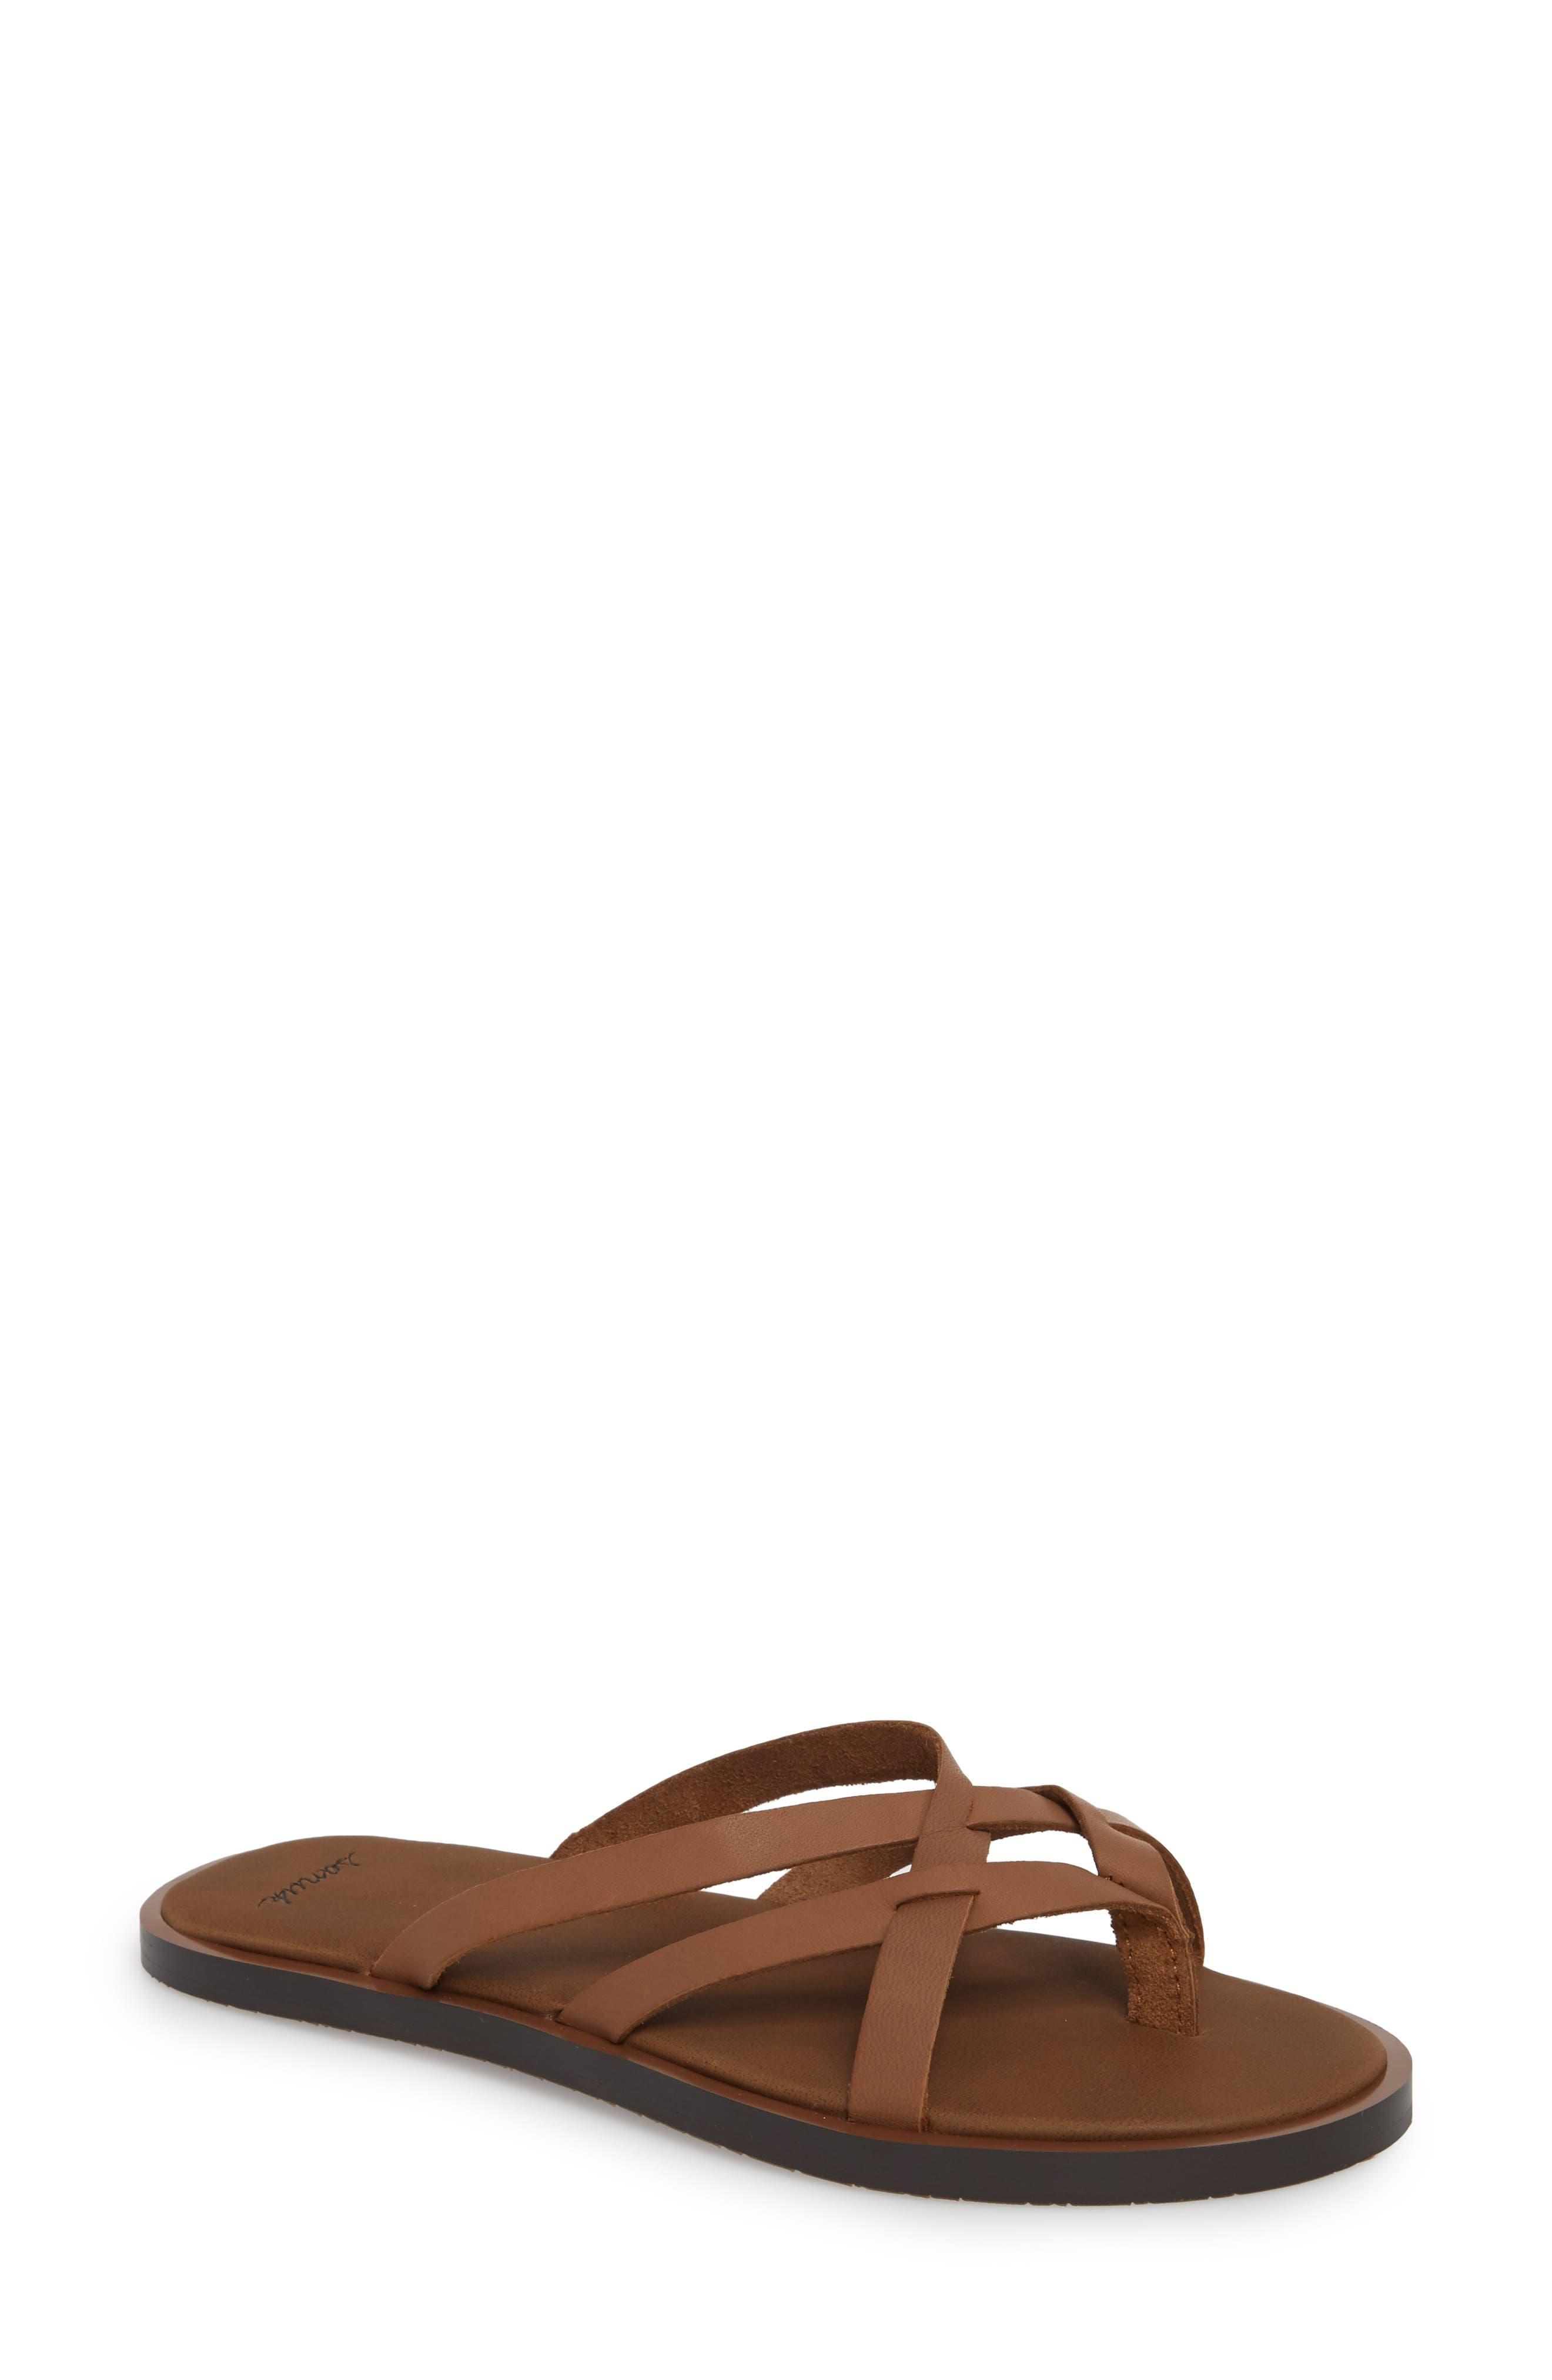 Yoga Strappy Thong Sandal,                             Main thumbnail 2, color,